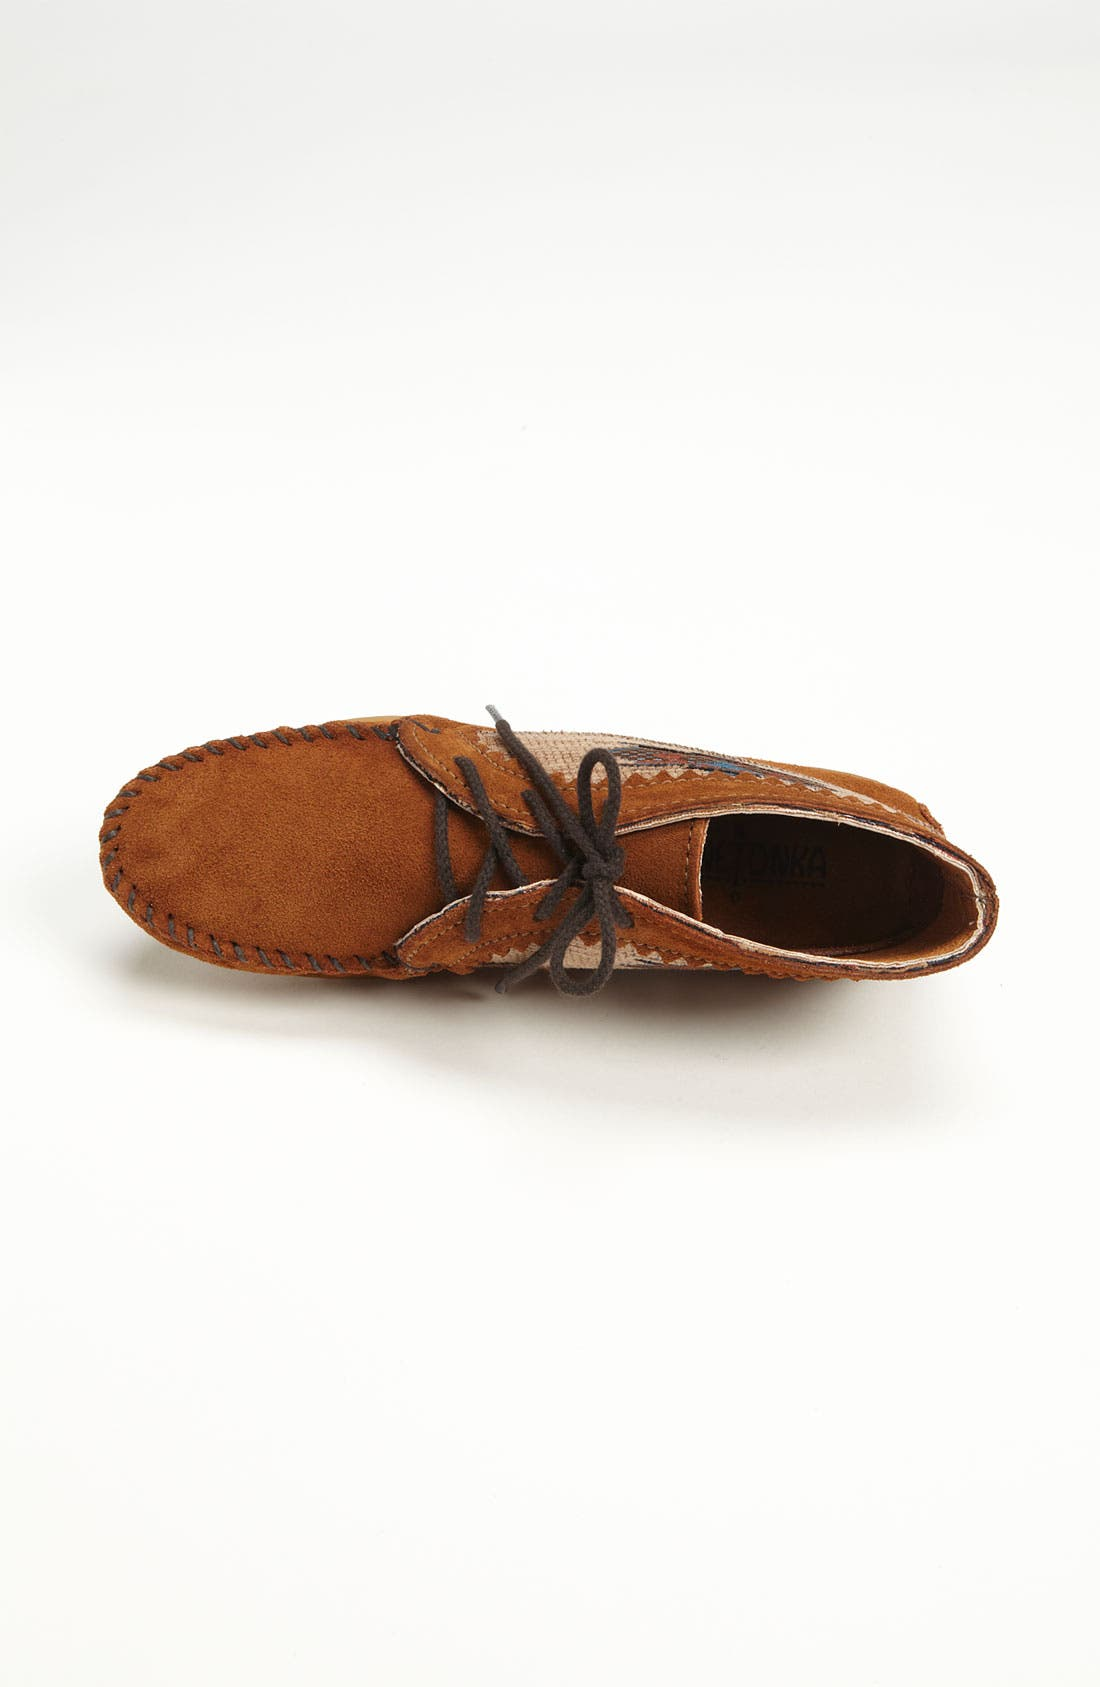 'El Paso' Ankle Boot,                             Alternate thumbnail 4, color,                             211